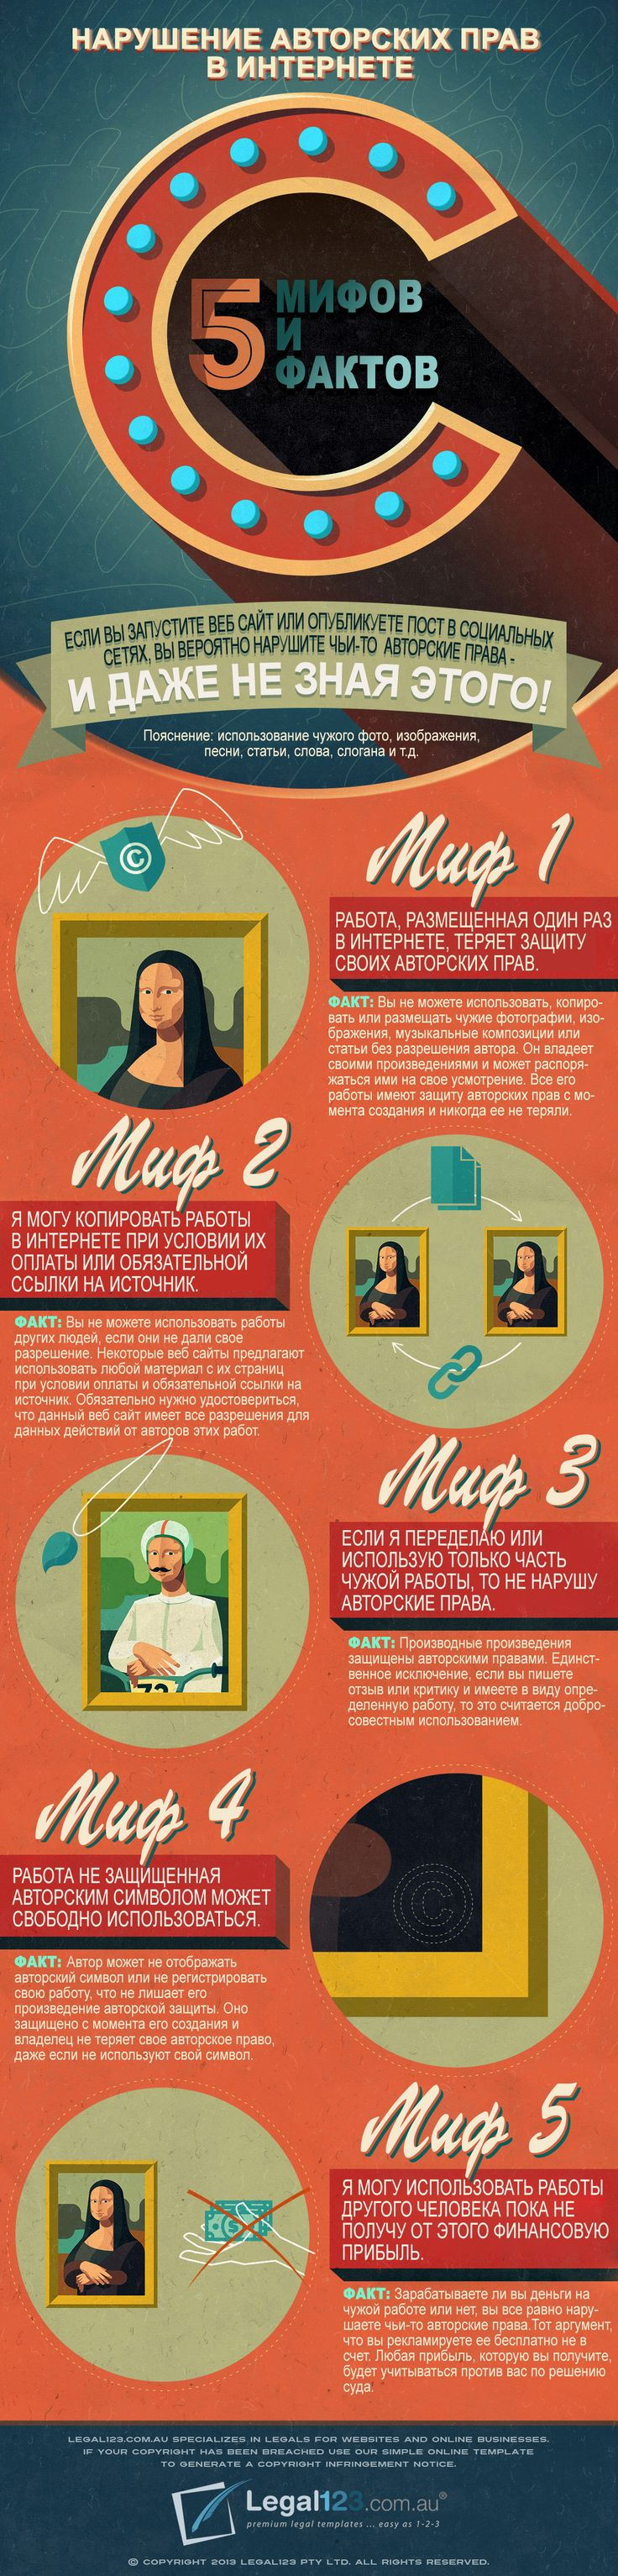 Нарушение авторских прав в интернете #Инфографика